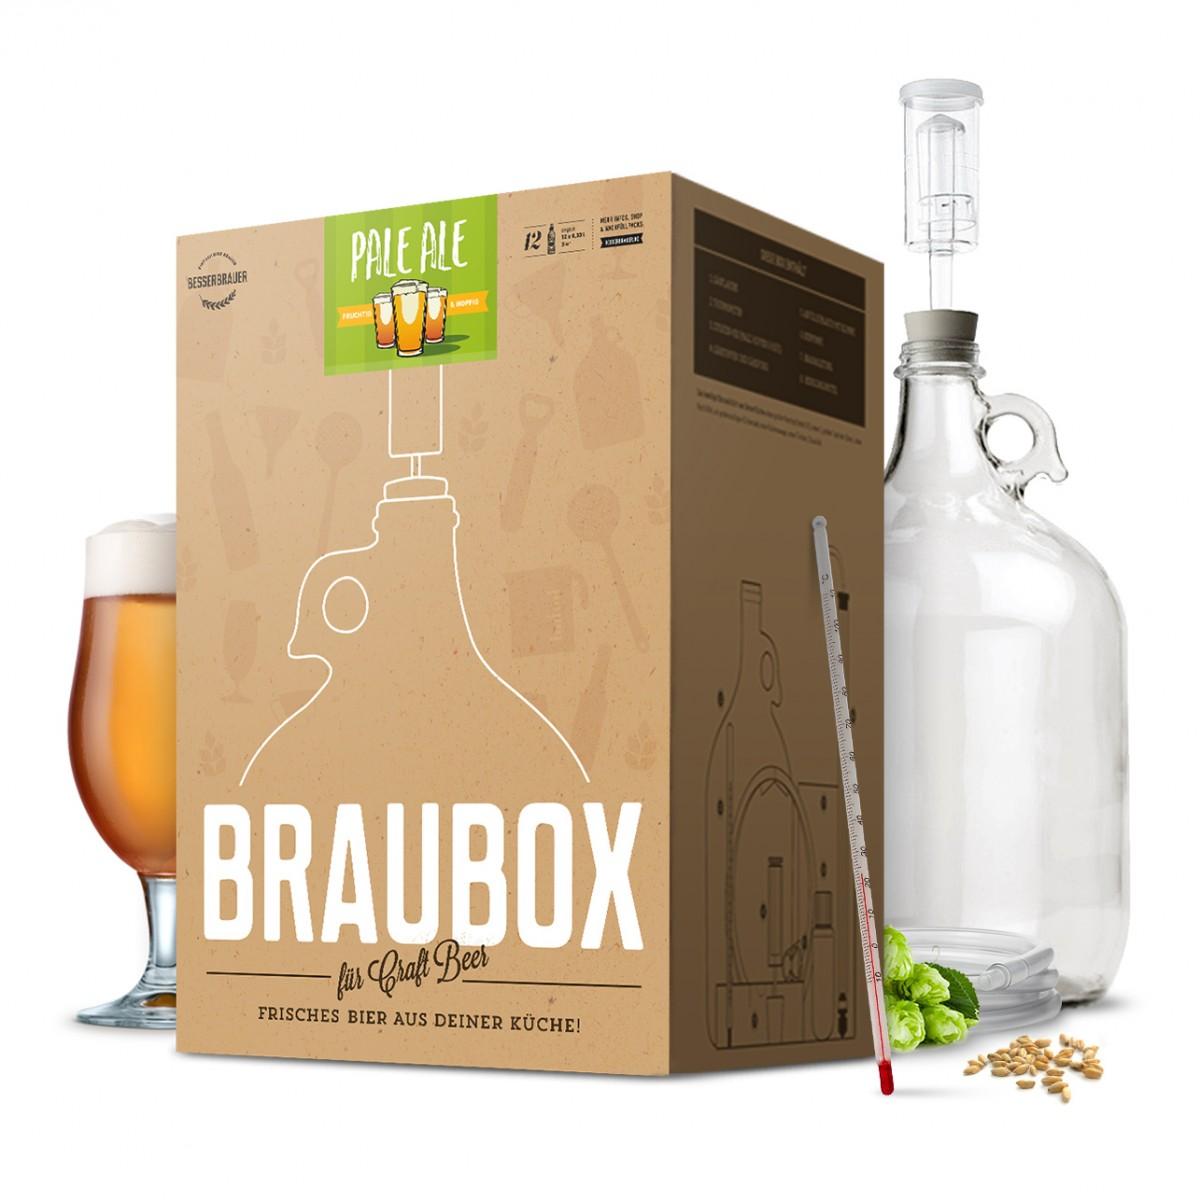 braubox-paleale